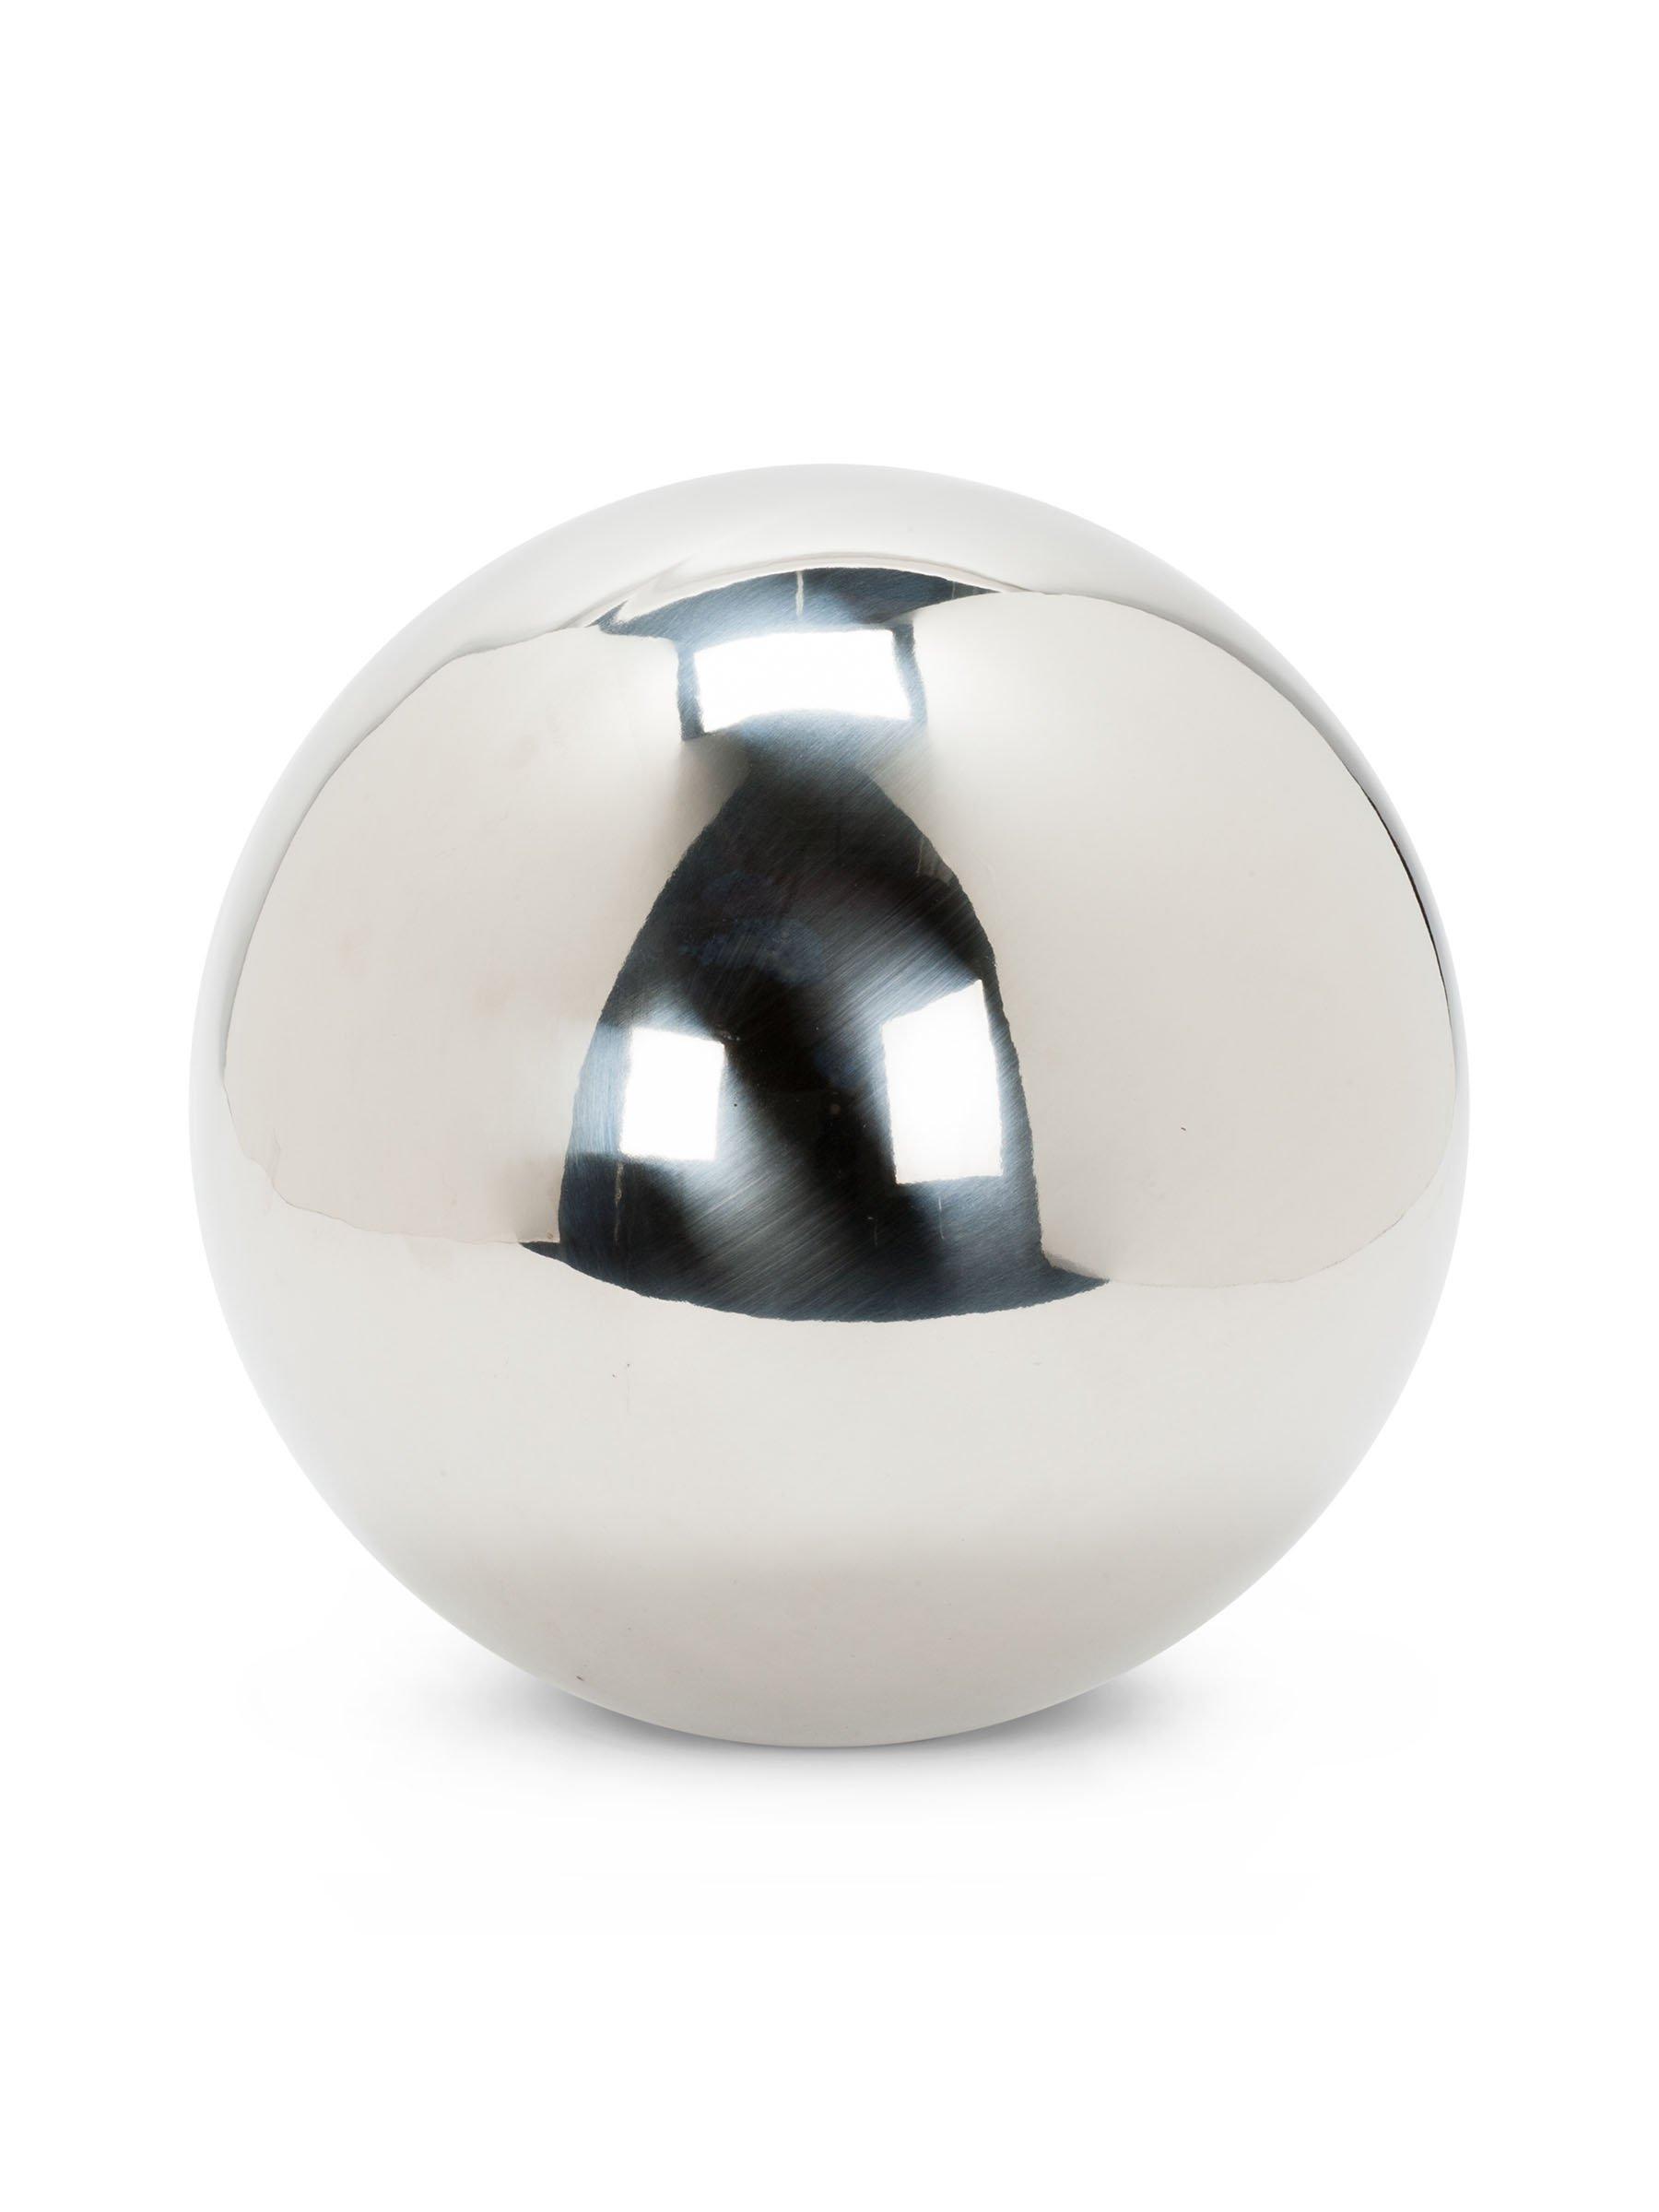 Abbott Collection Garden Gazing Ball, Silver (Extra Large)